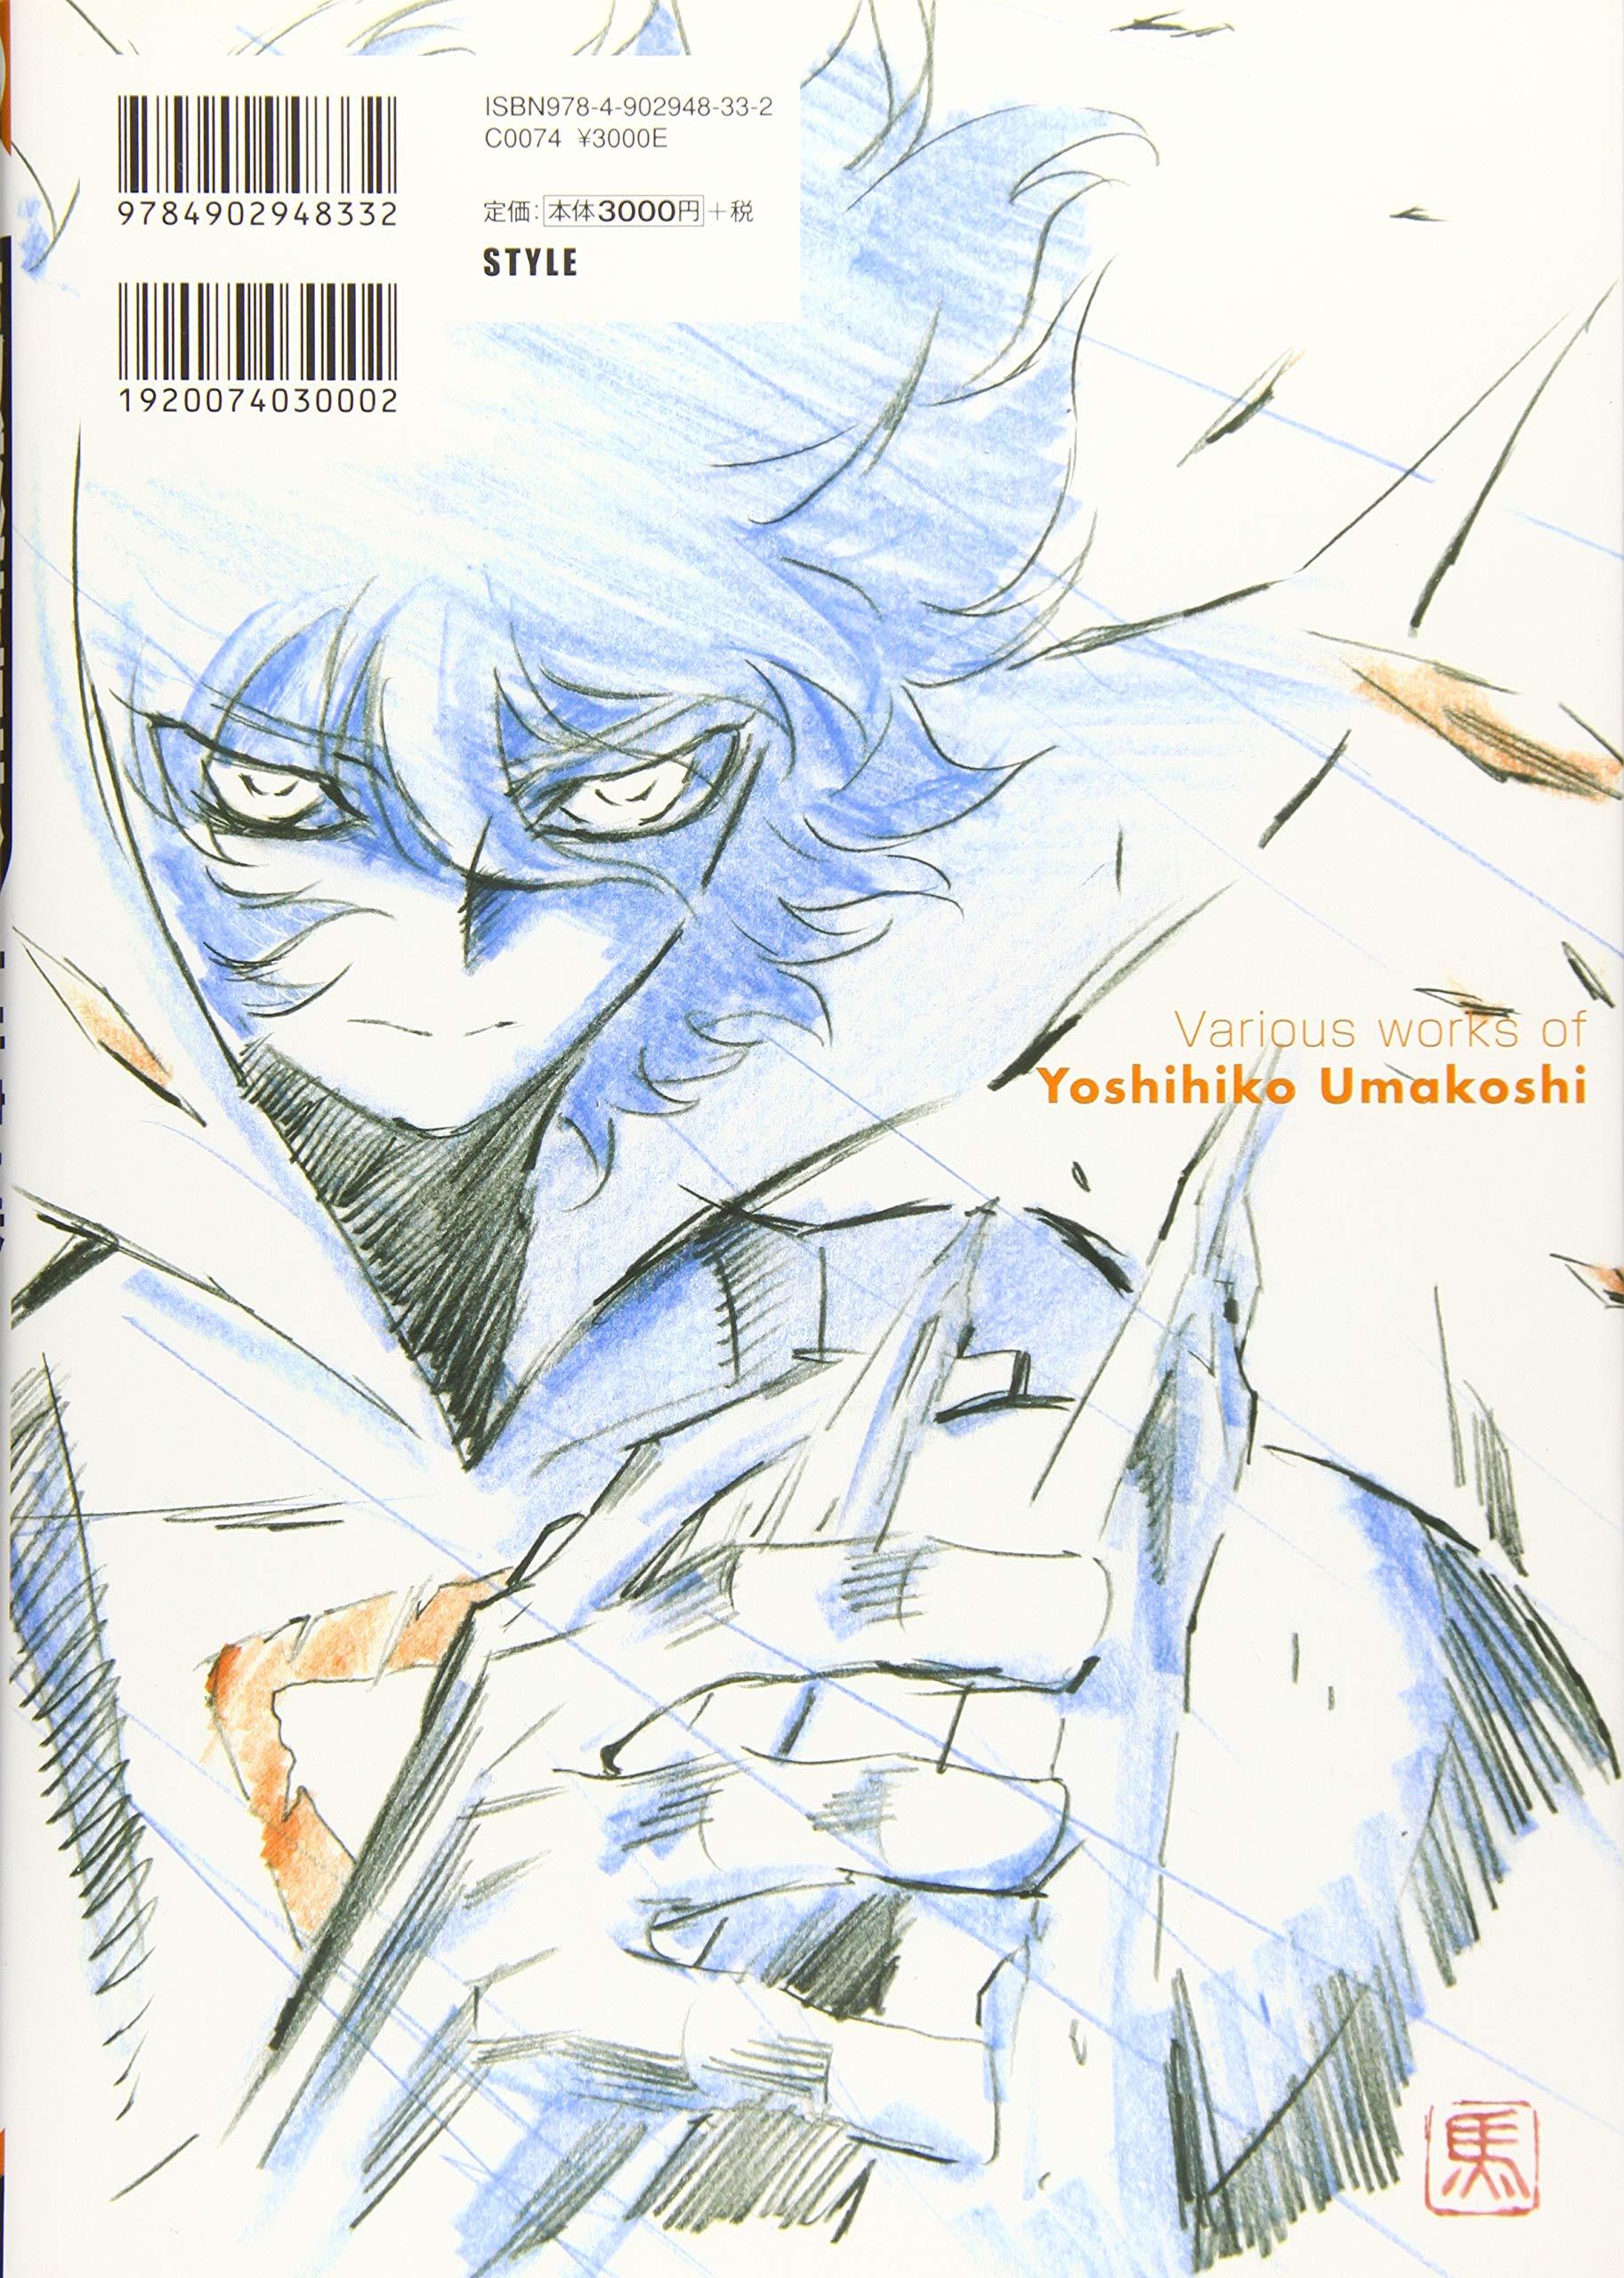 3-7 Days JPYoshihiko Umakoshi Various Works Vol.1